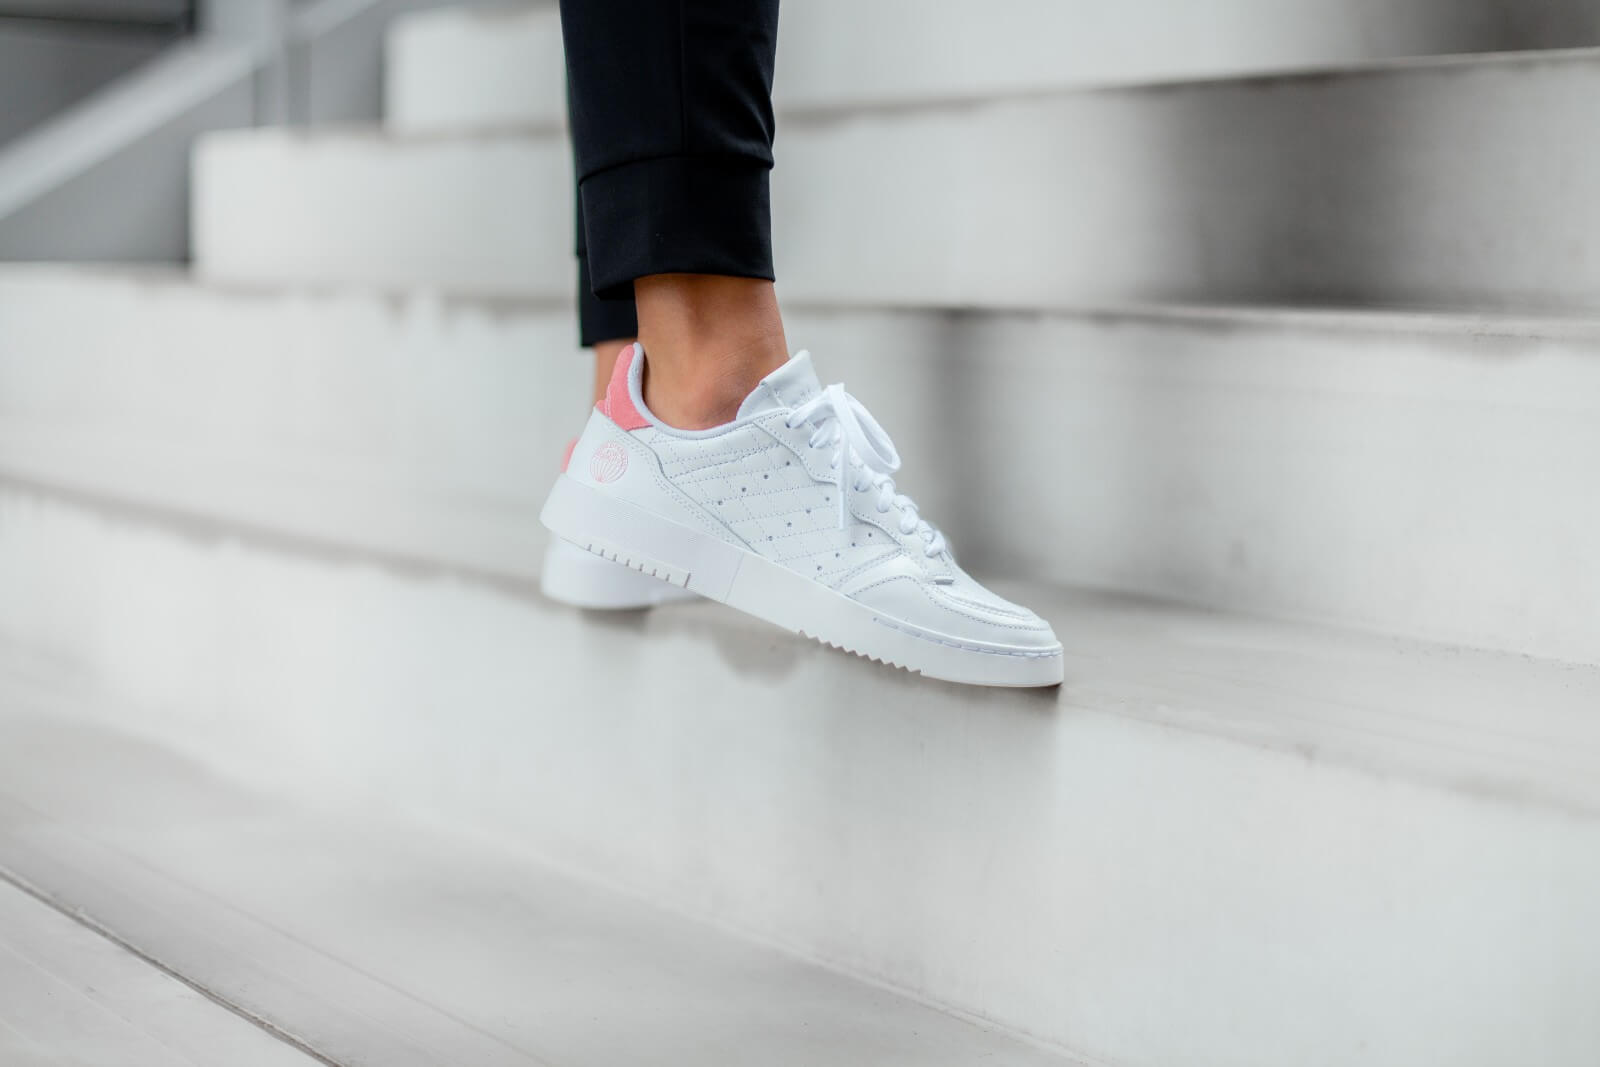 Supercourt Footwear White/Glow Pink